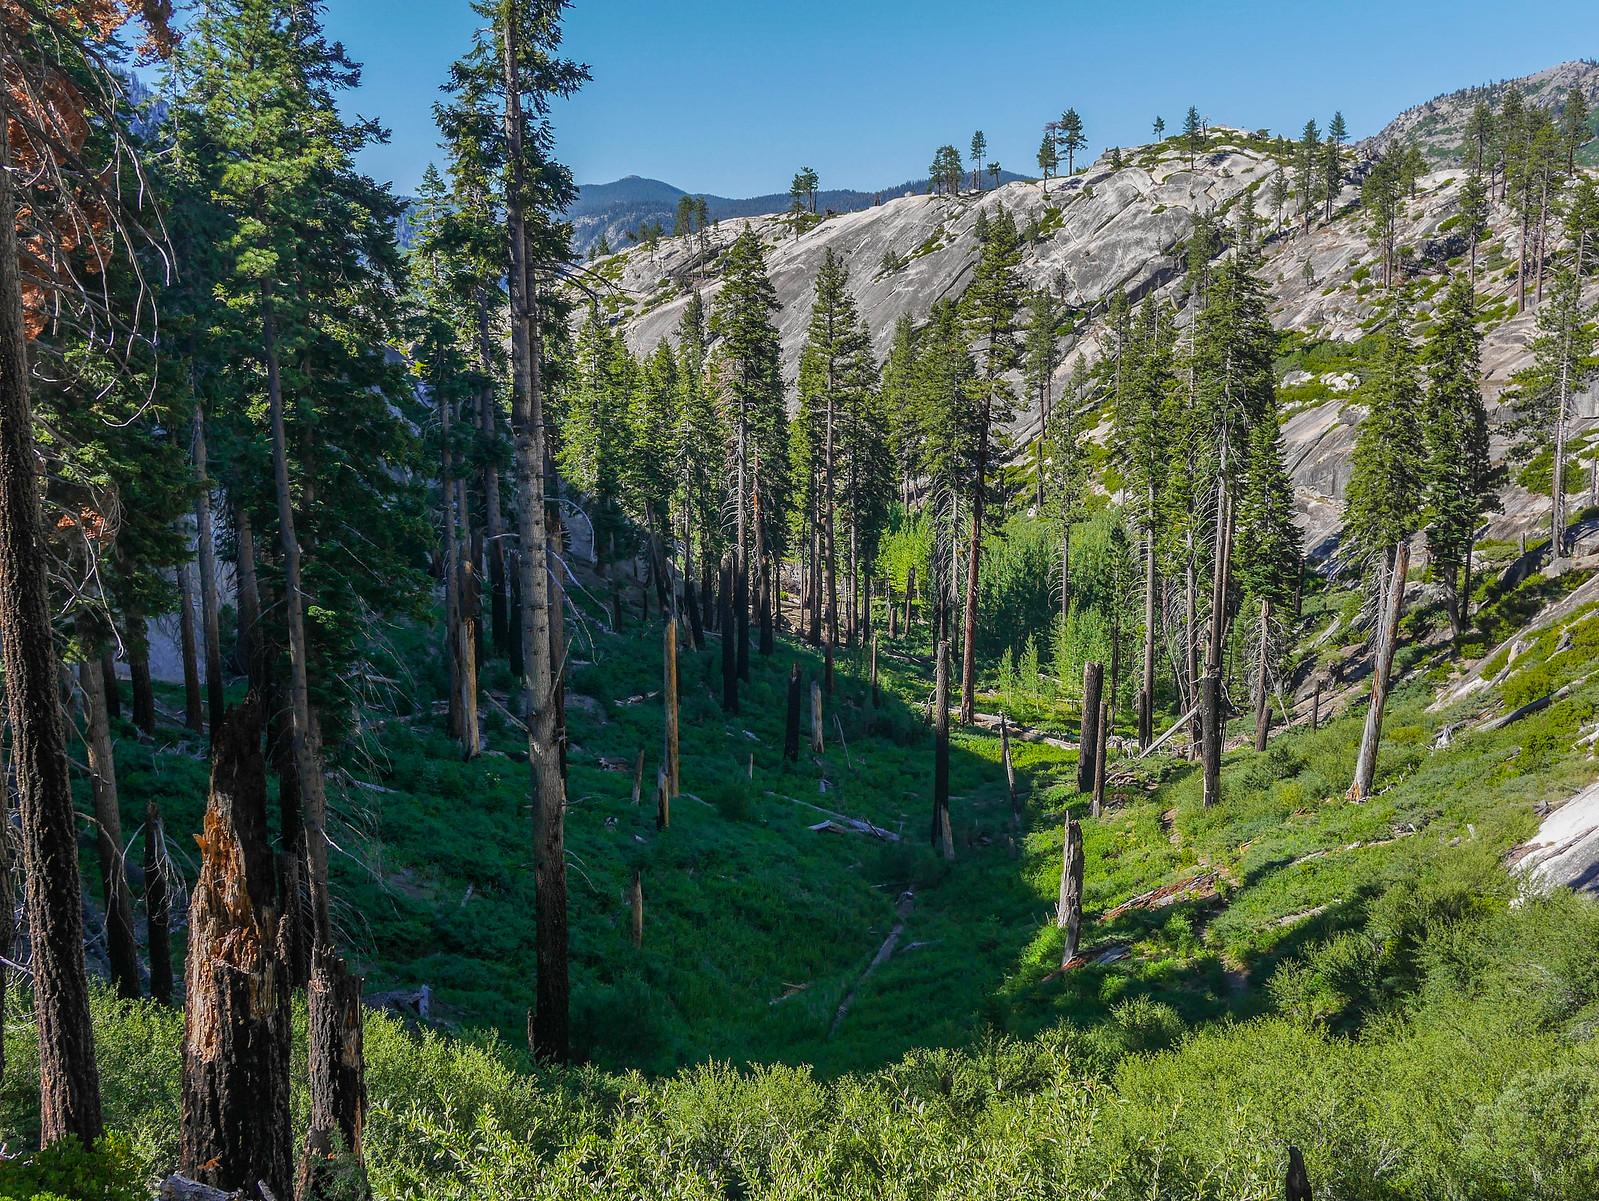 Heading down towards Crater Creek